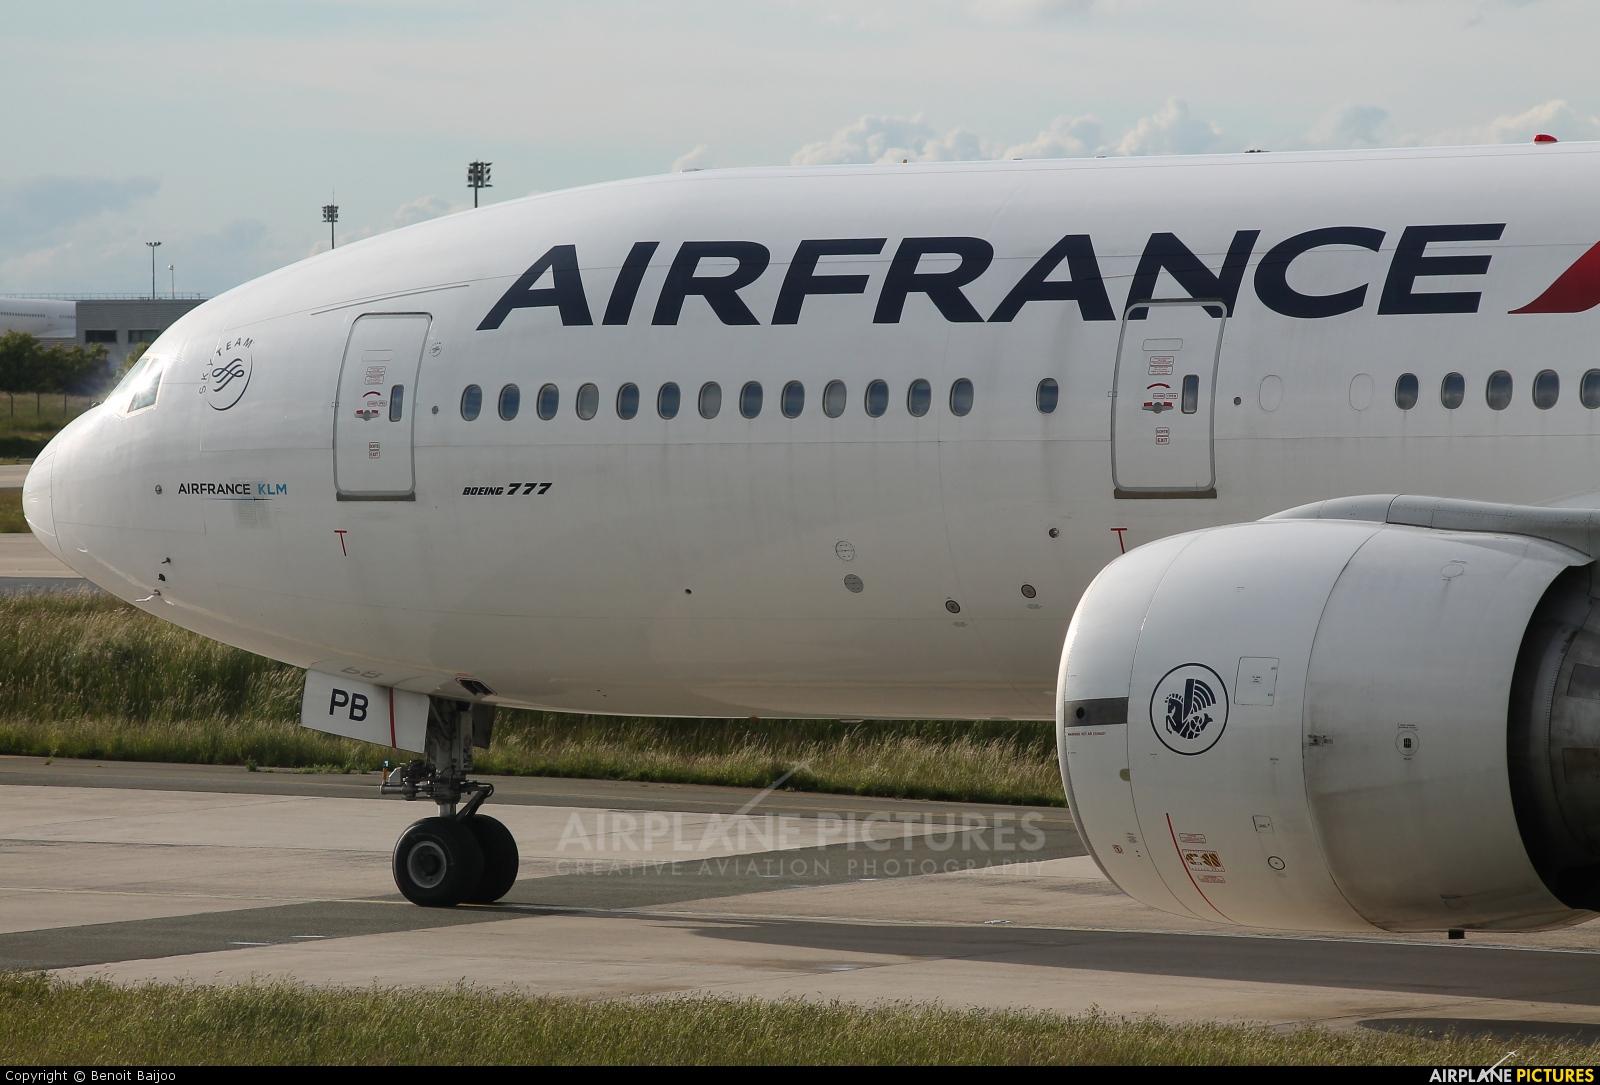 Air France F-GSPB aircraft at Paris - Charles de Gaulle